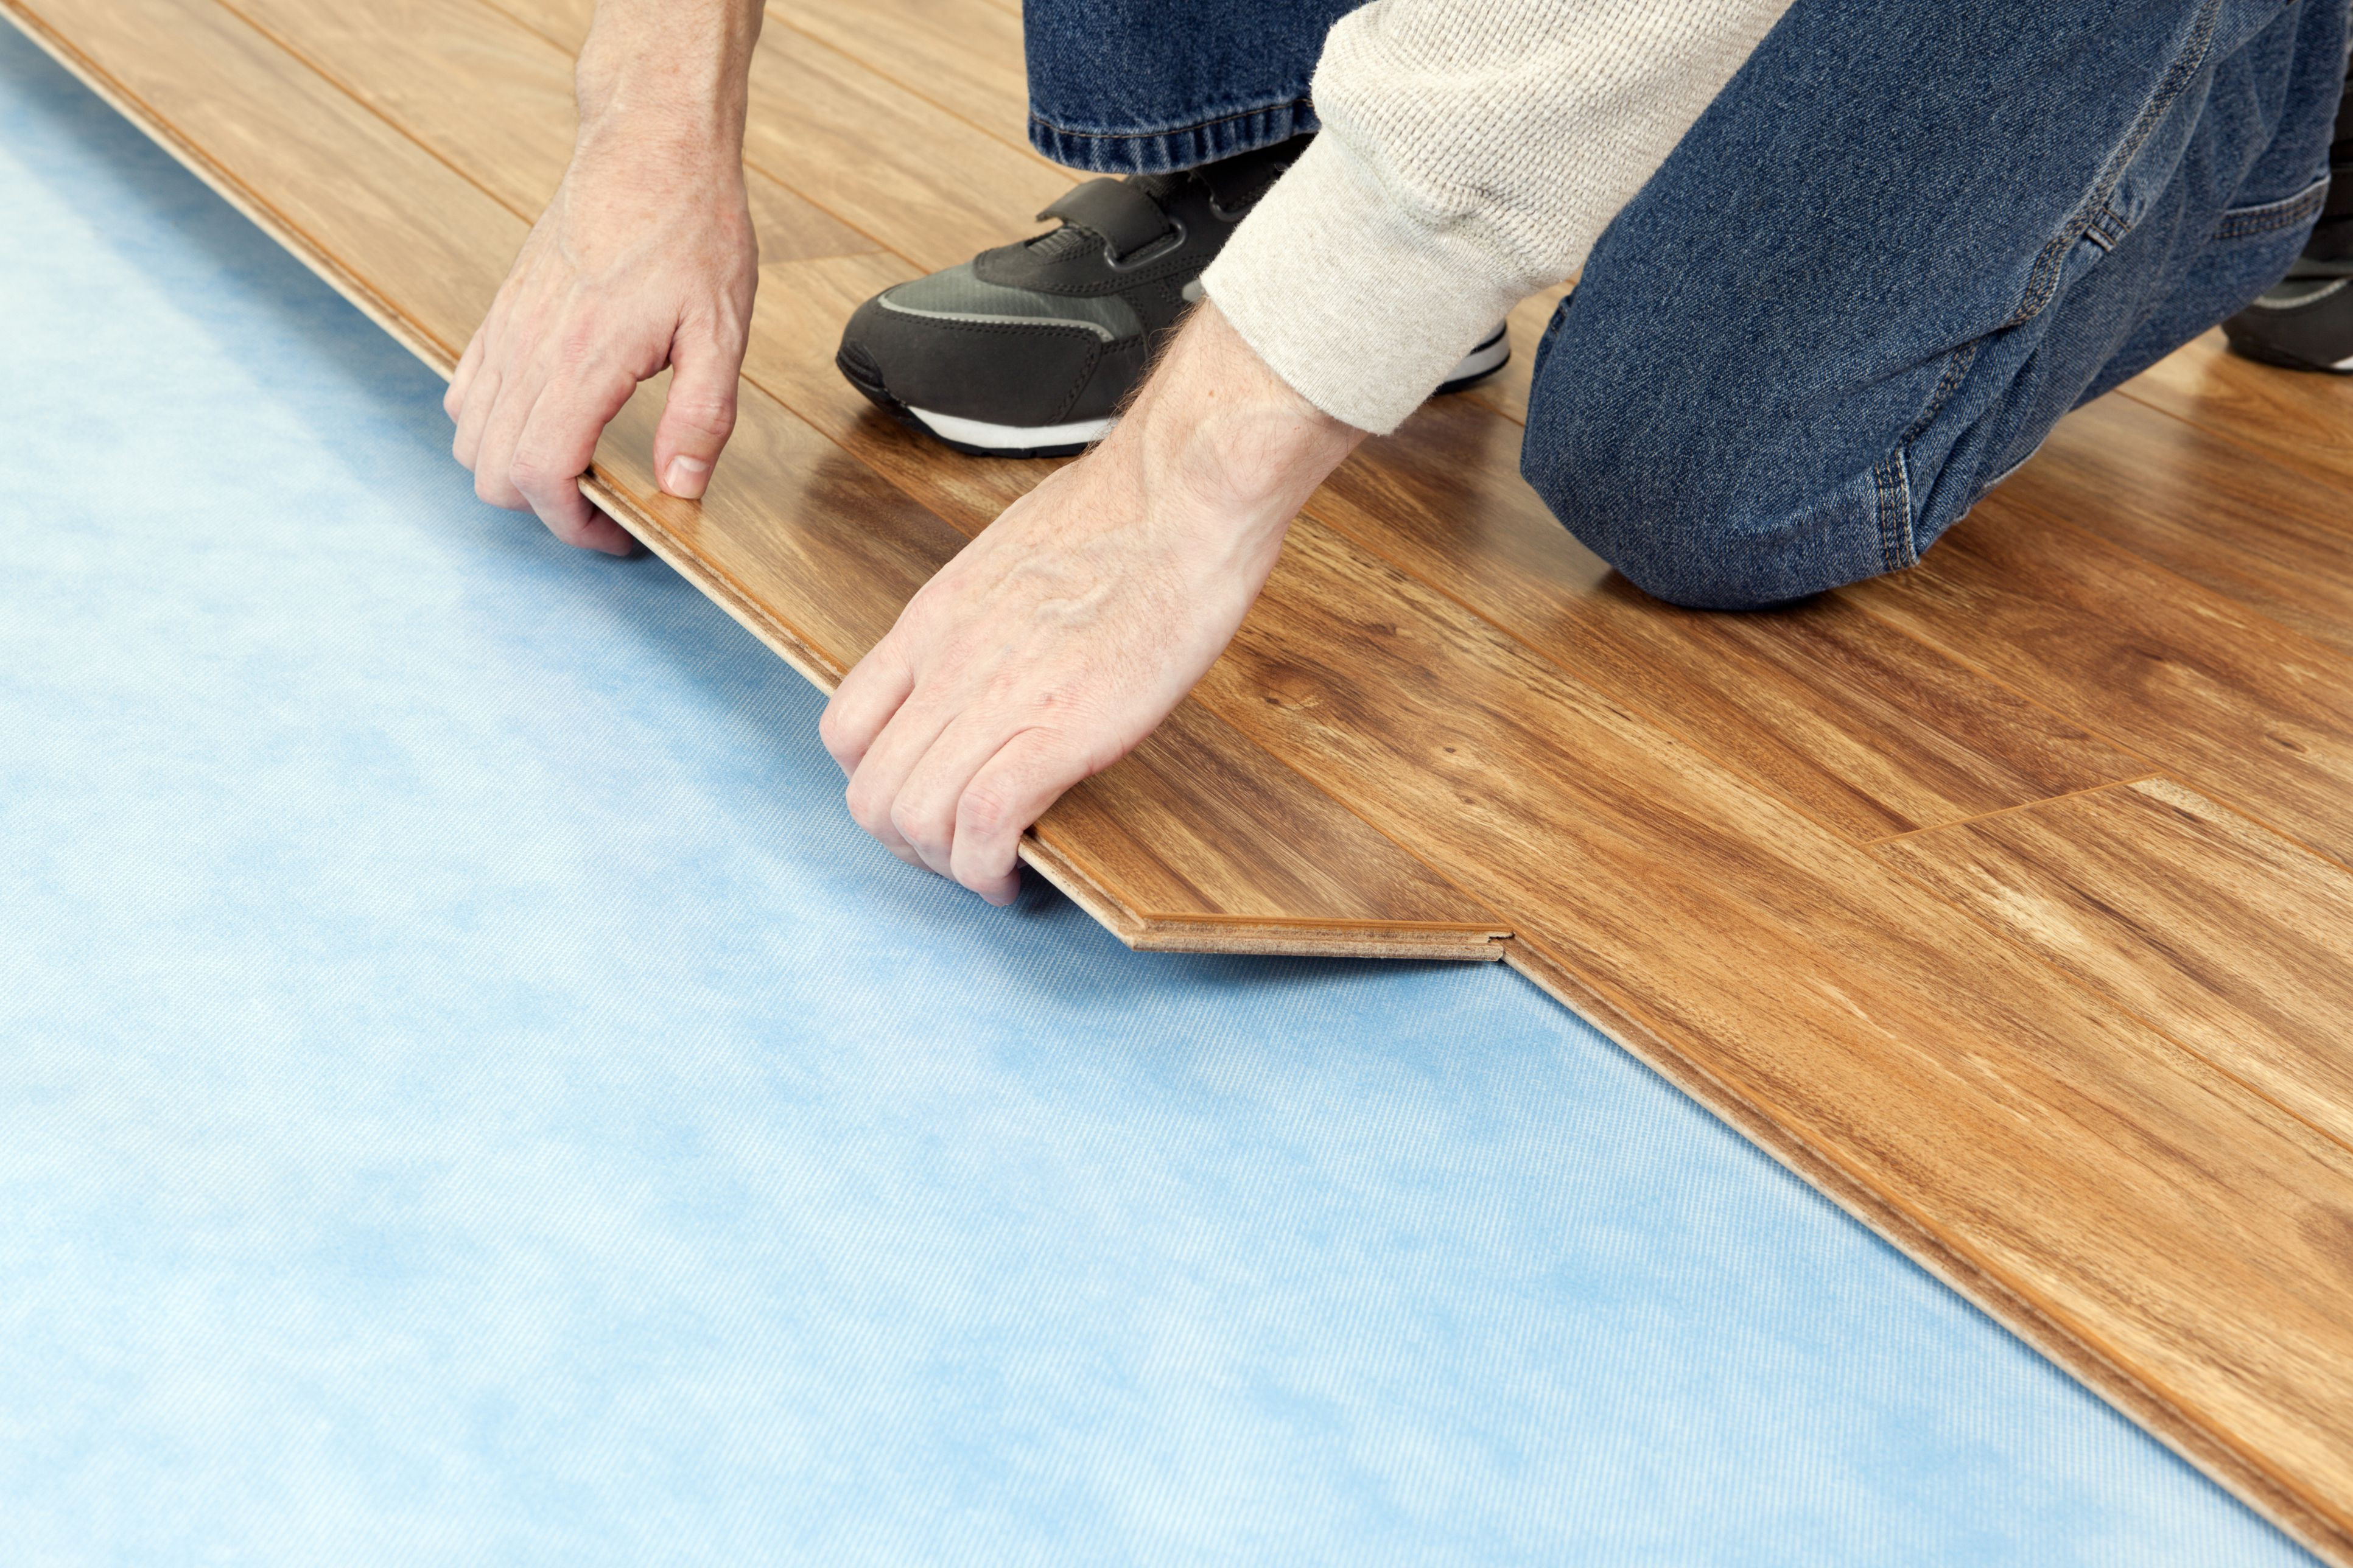 1 1 4 inch hardwood flooring of flooring underlayment the basics throughout new floor installation 185270632 582b722c3df78c6f6af0a8ab